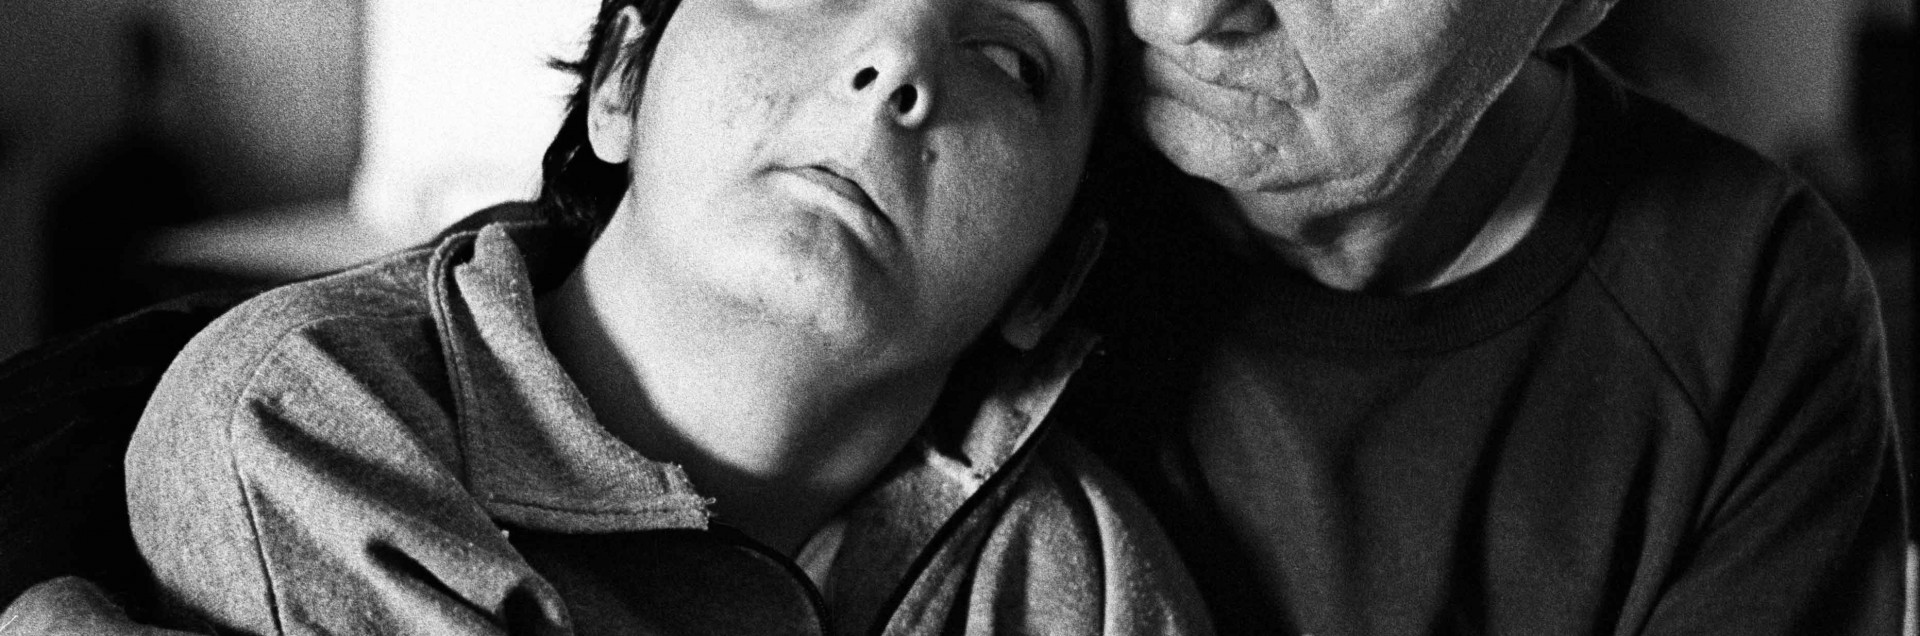 Vite sospese <br>Foto di Francesco Cito